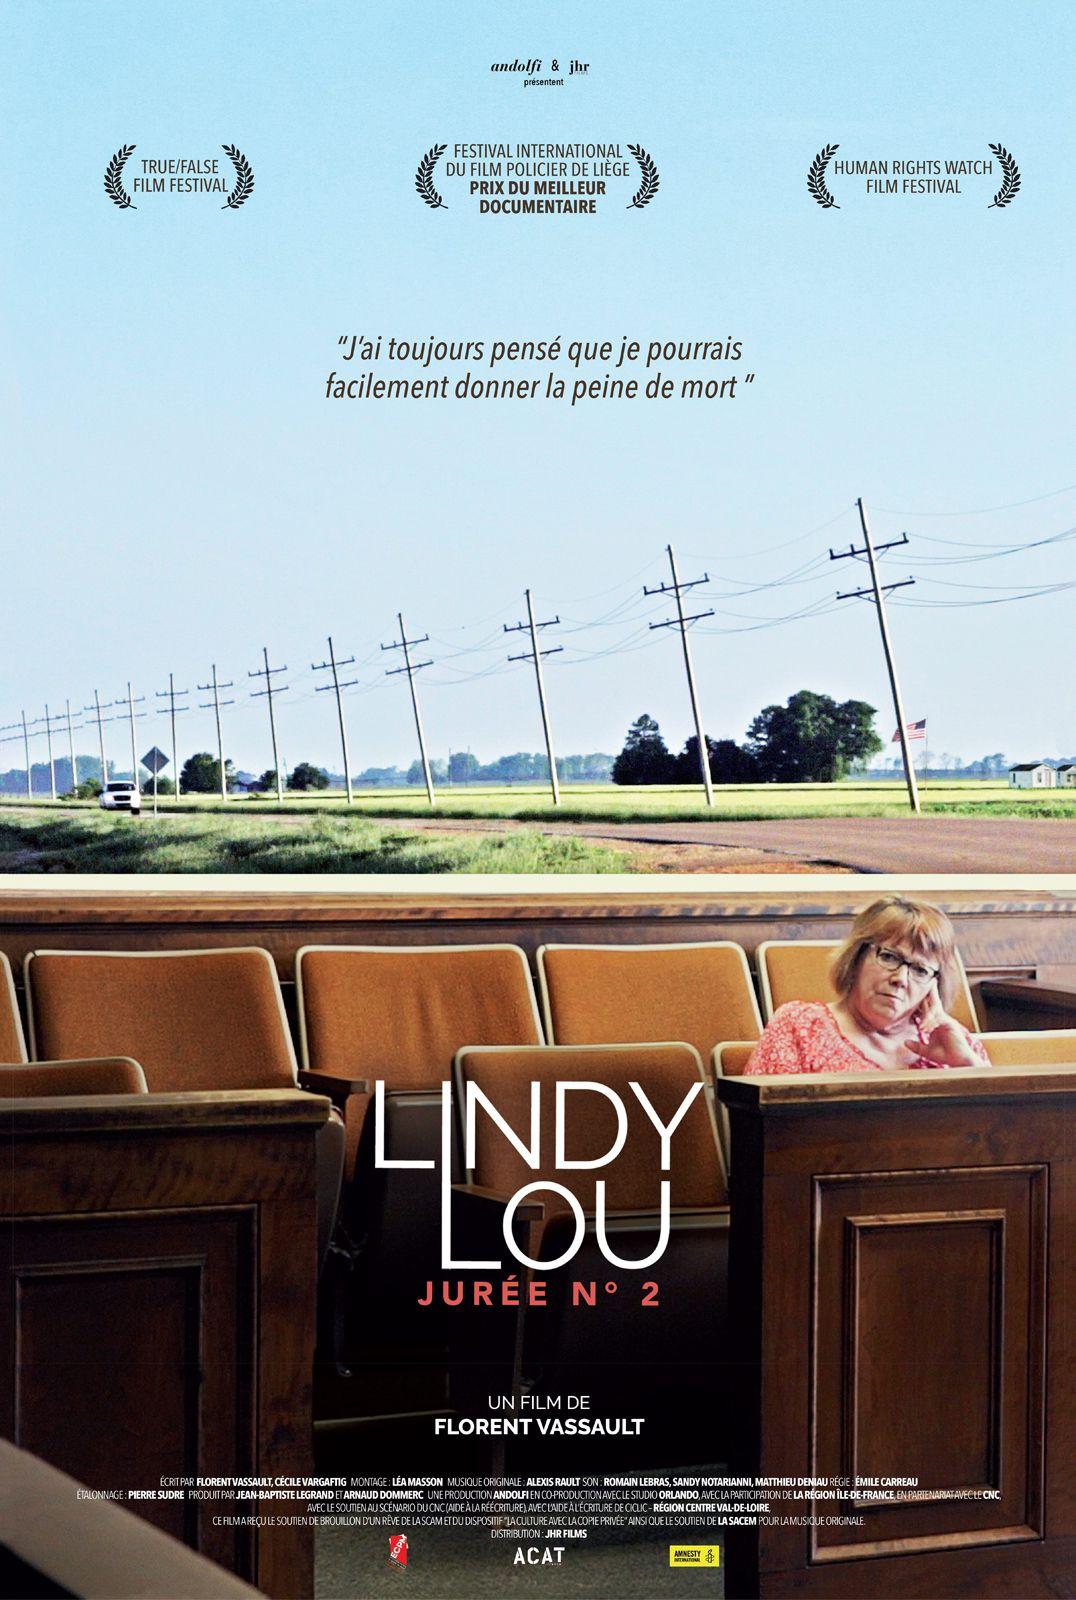 Lindy Lou, jurée n°2 - Documentaire (2018)